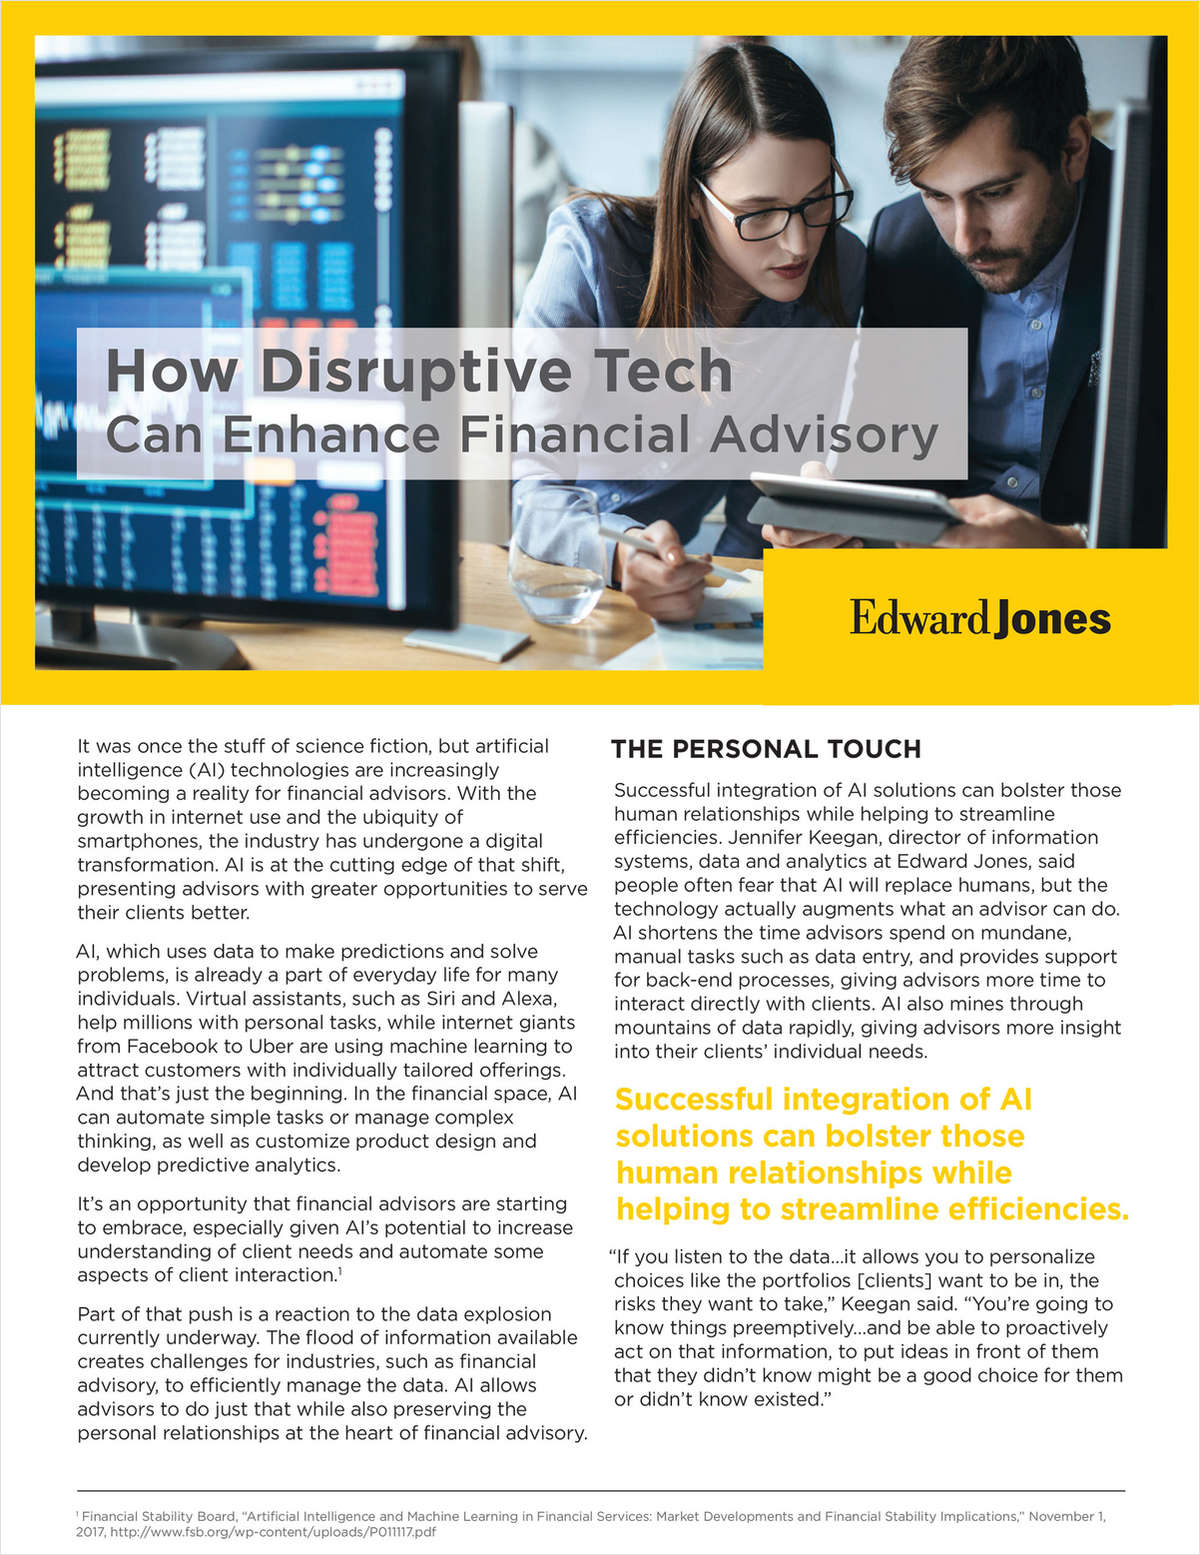 How Disruptive Tech Can Enhance Financial Advisory